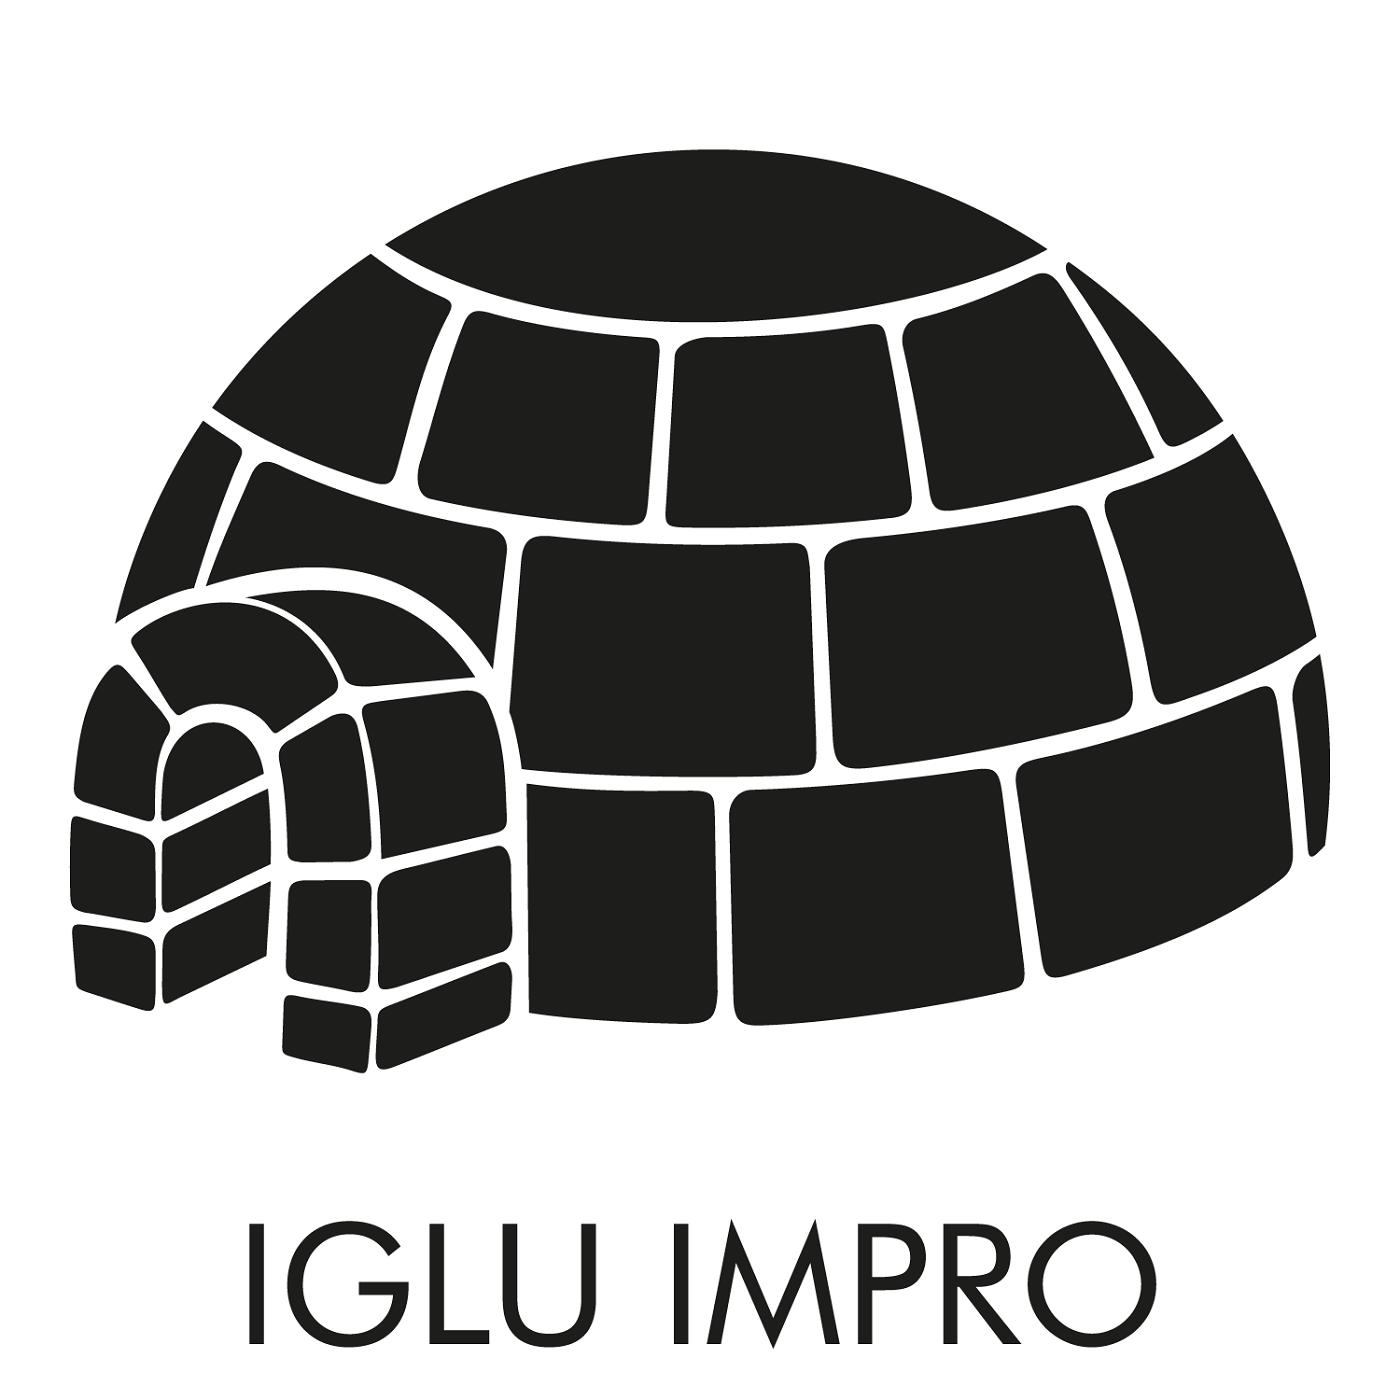 Iglu impro